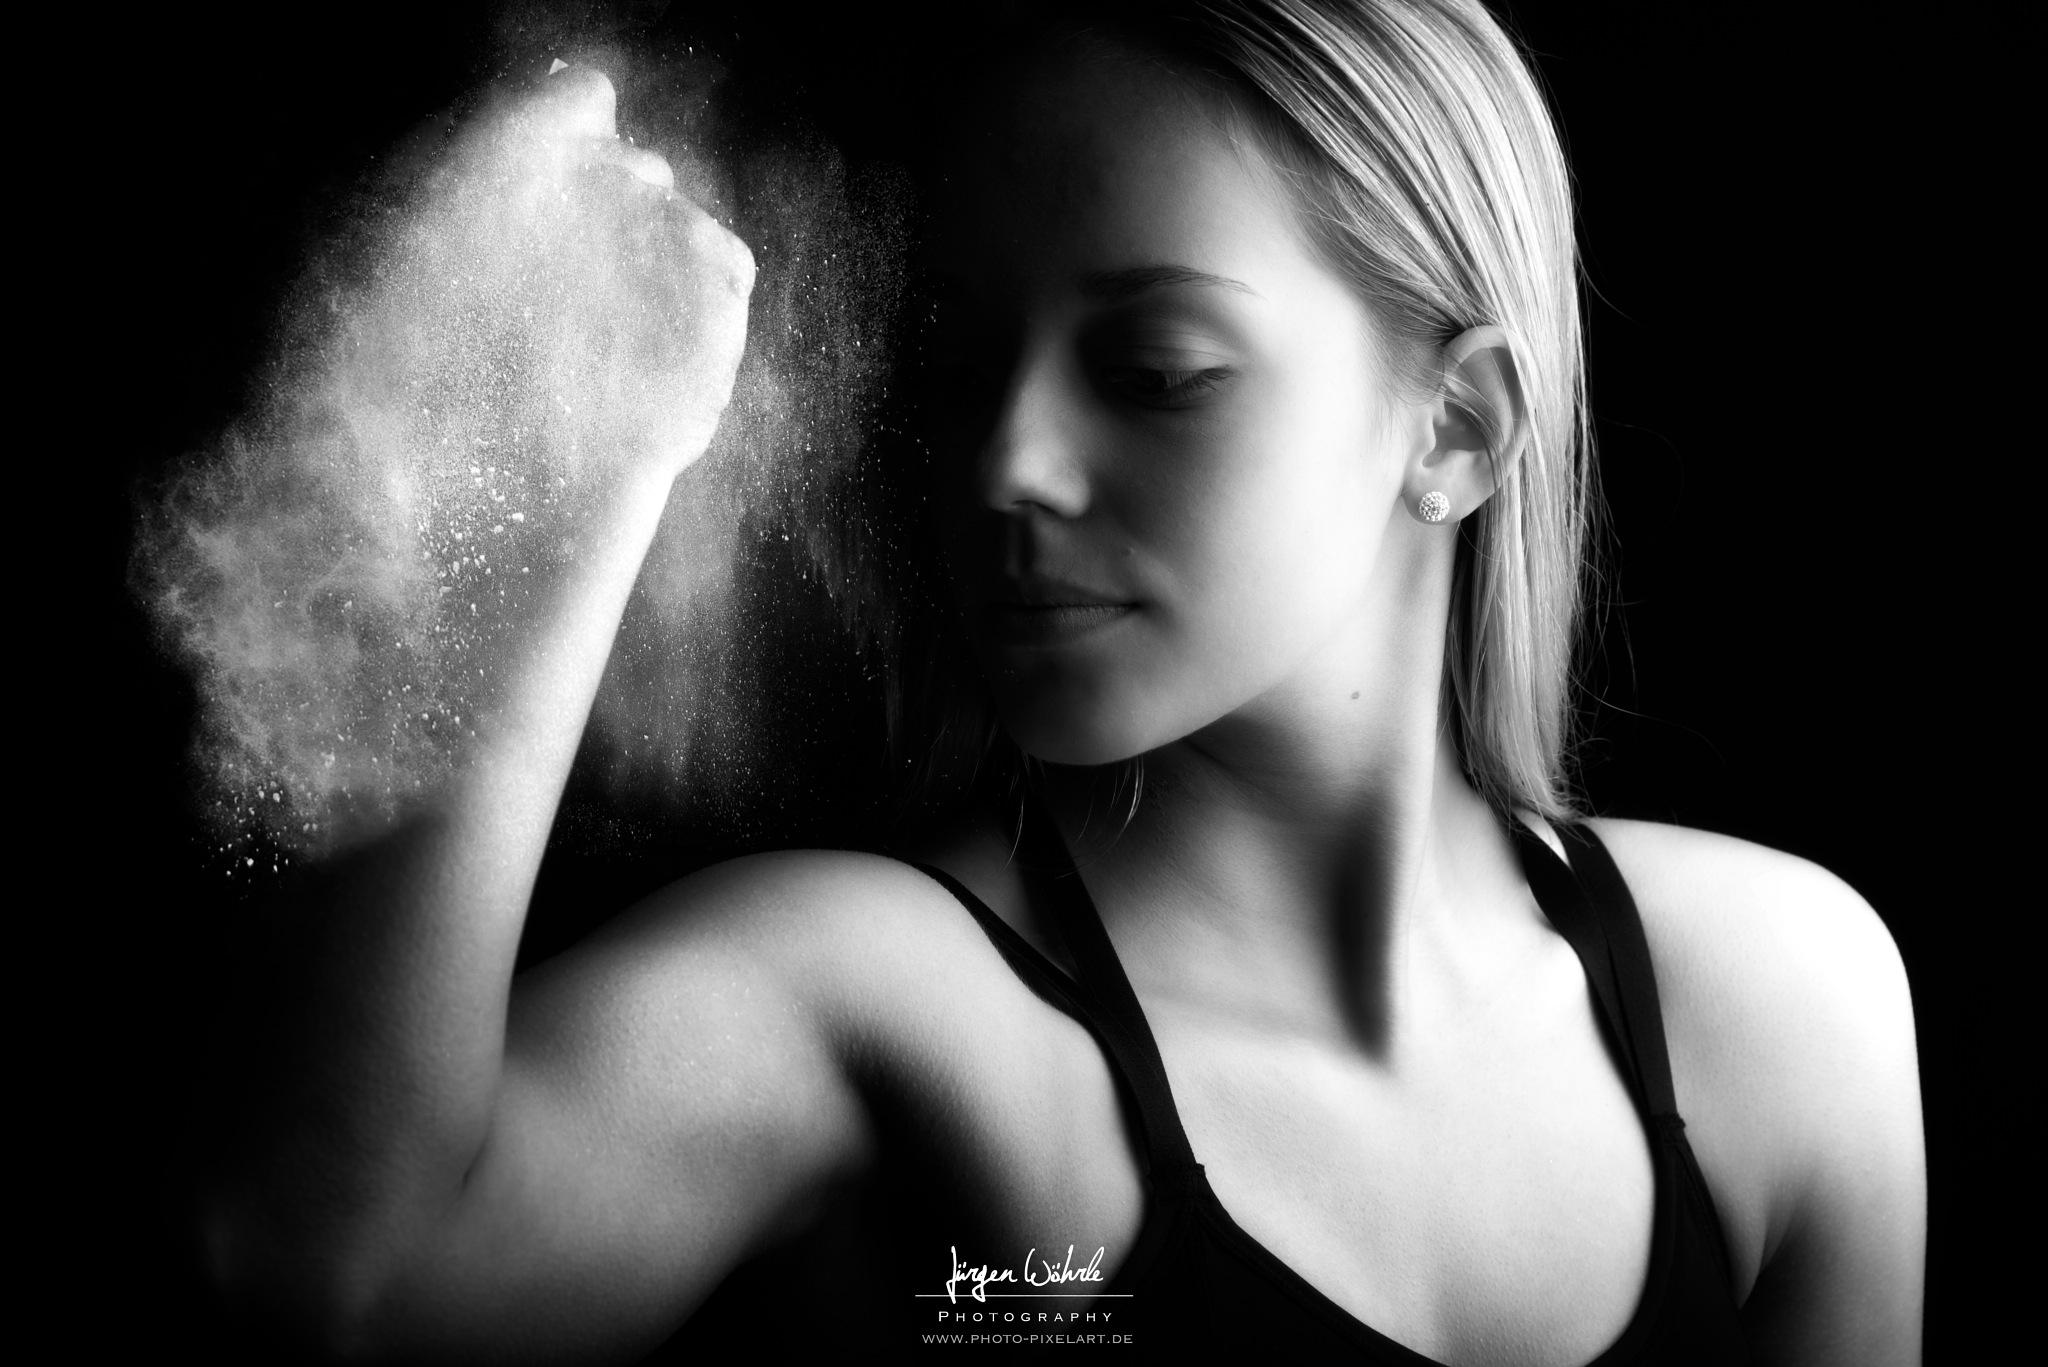 Gym Girl by Jürgen Wöhrle by Photo-Pixelart